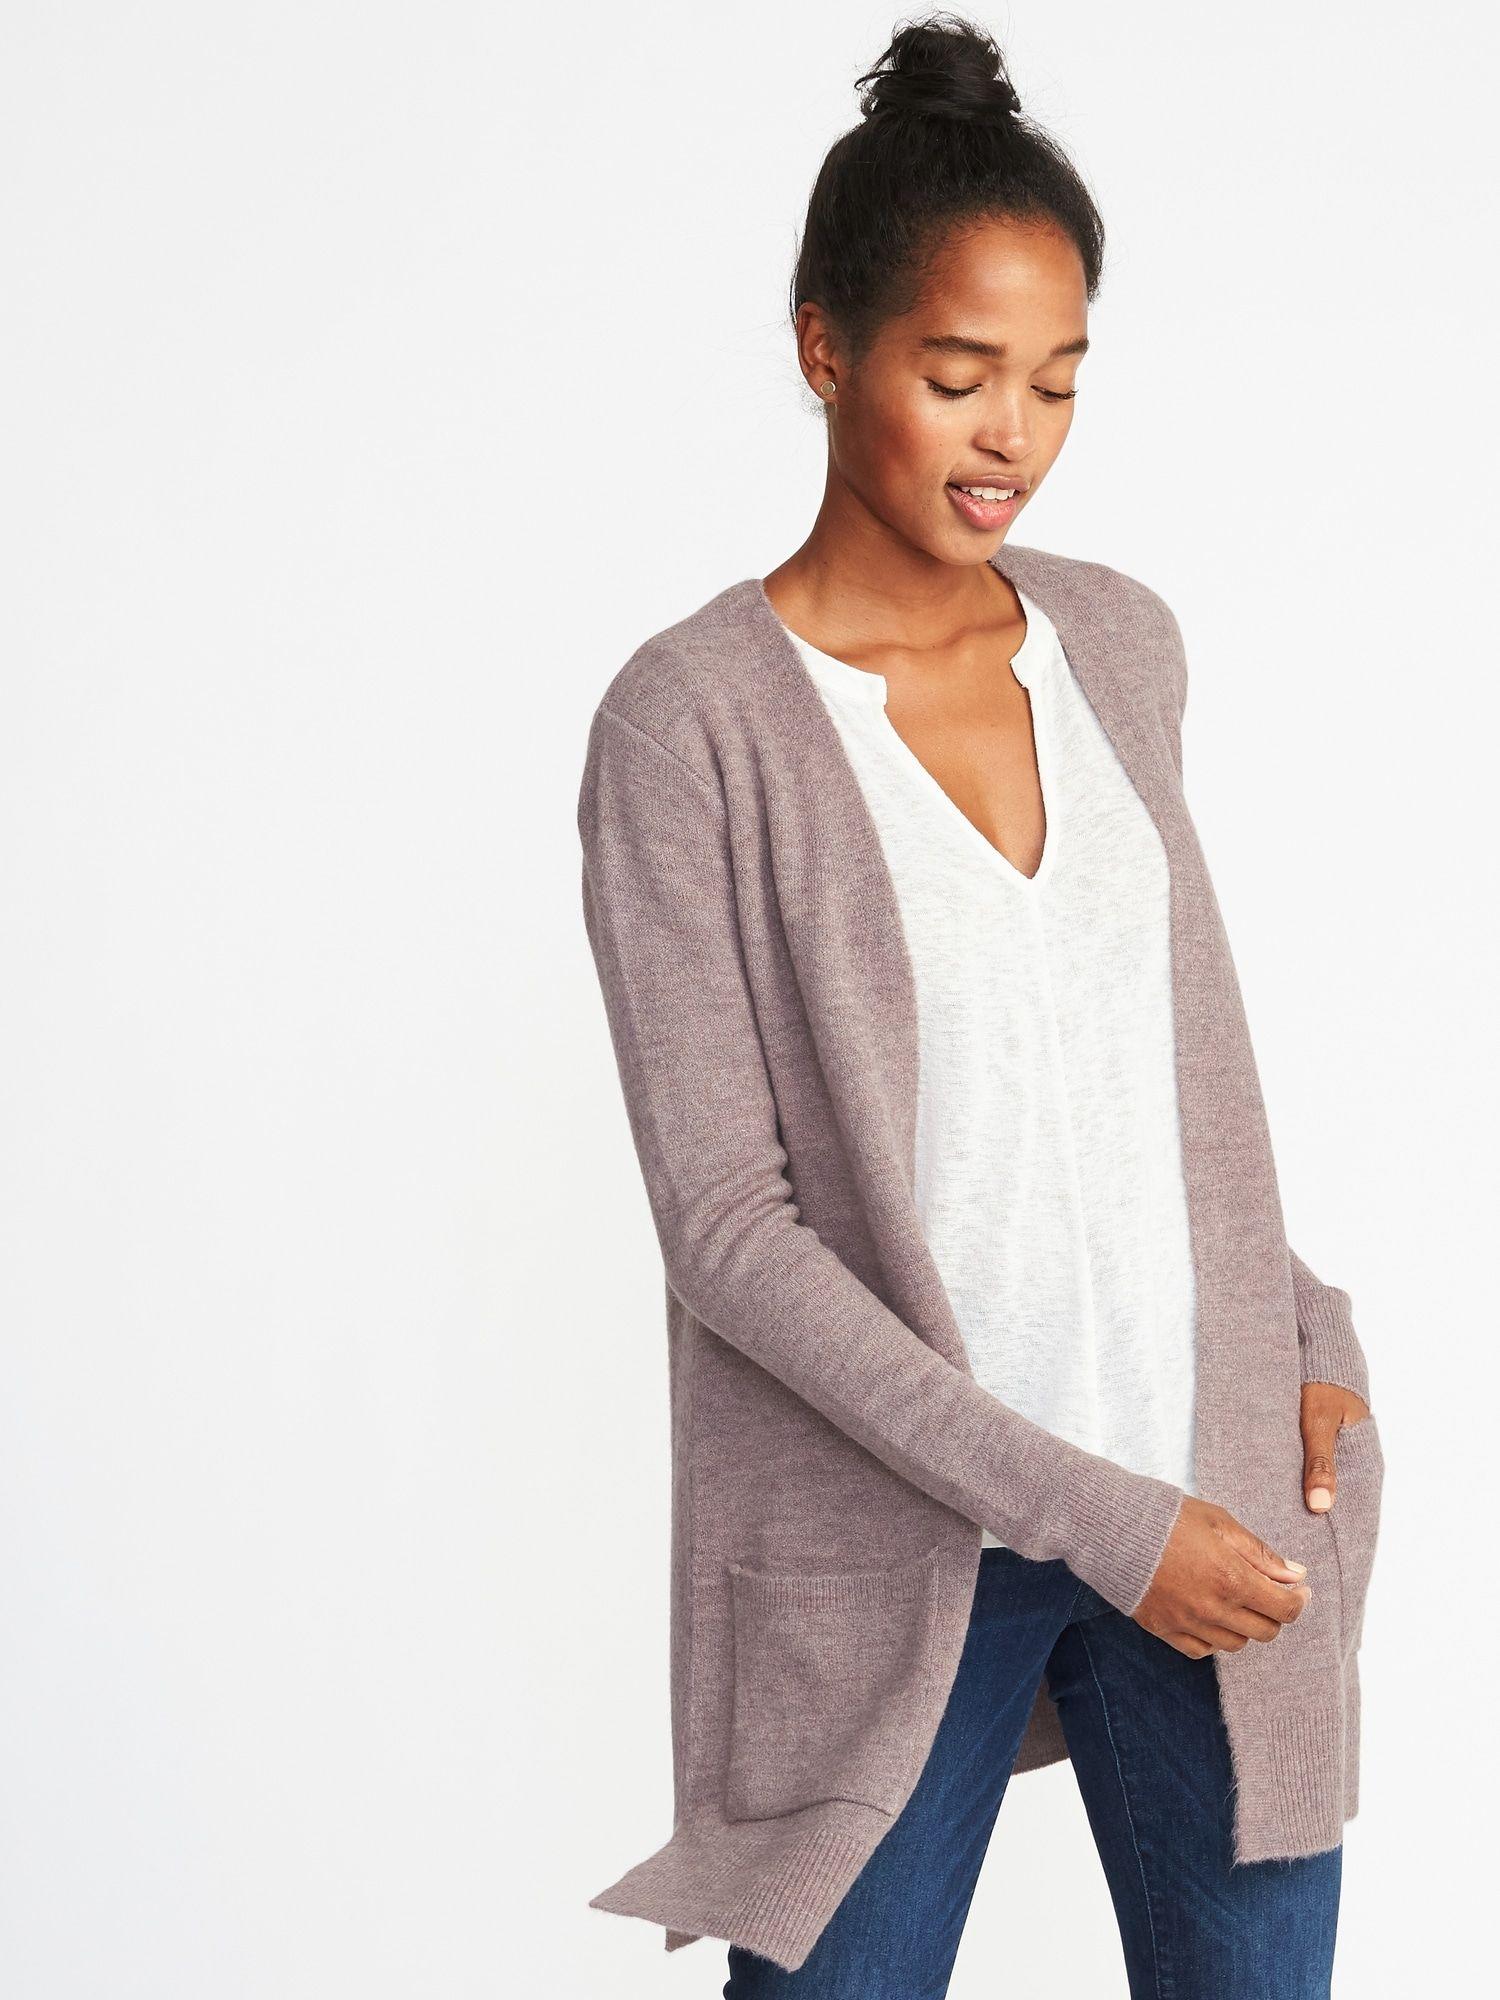 Plush,Knit Long,Line Open,Front Sweater for Women